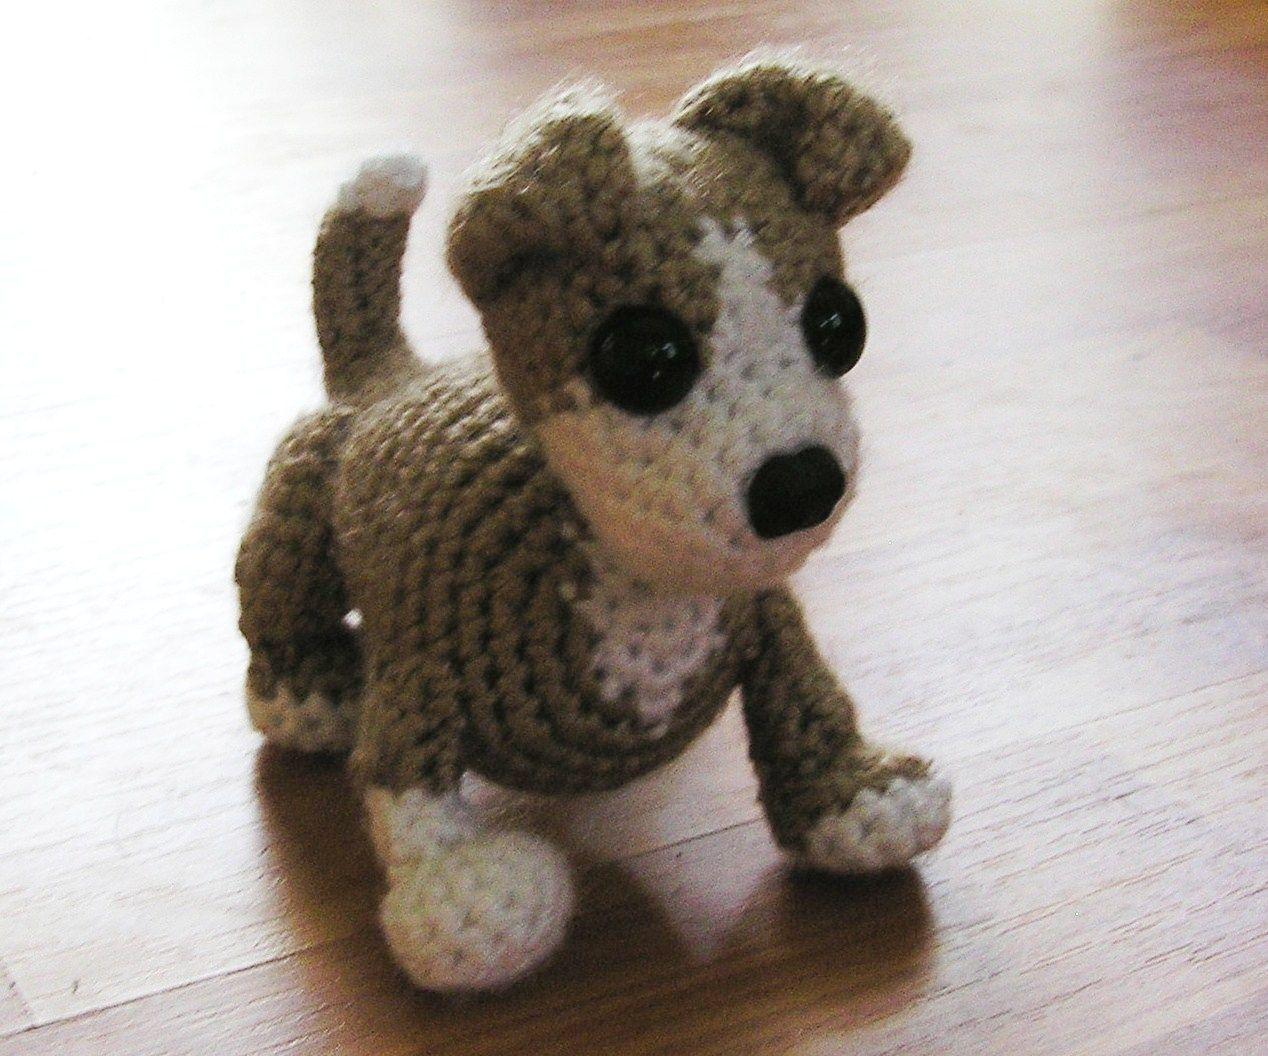 Amigurumi Lion Perritos : Download pitbull amigurumi pattern free things to try